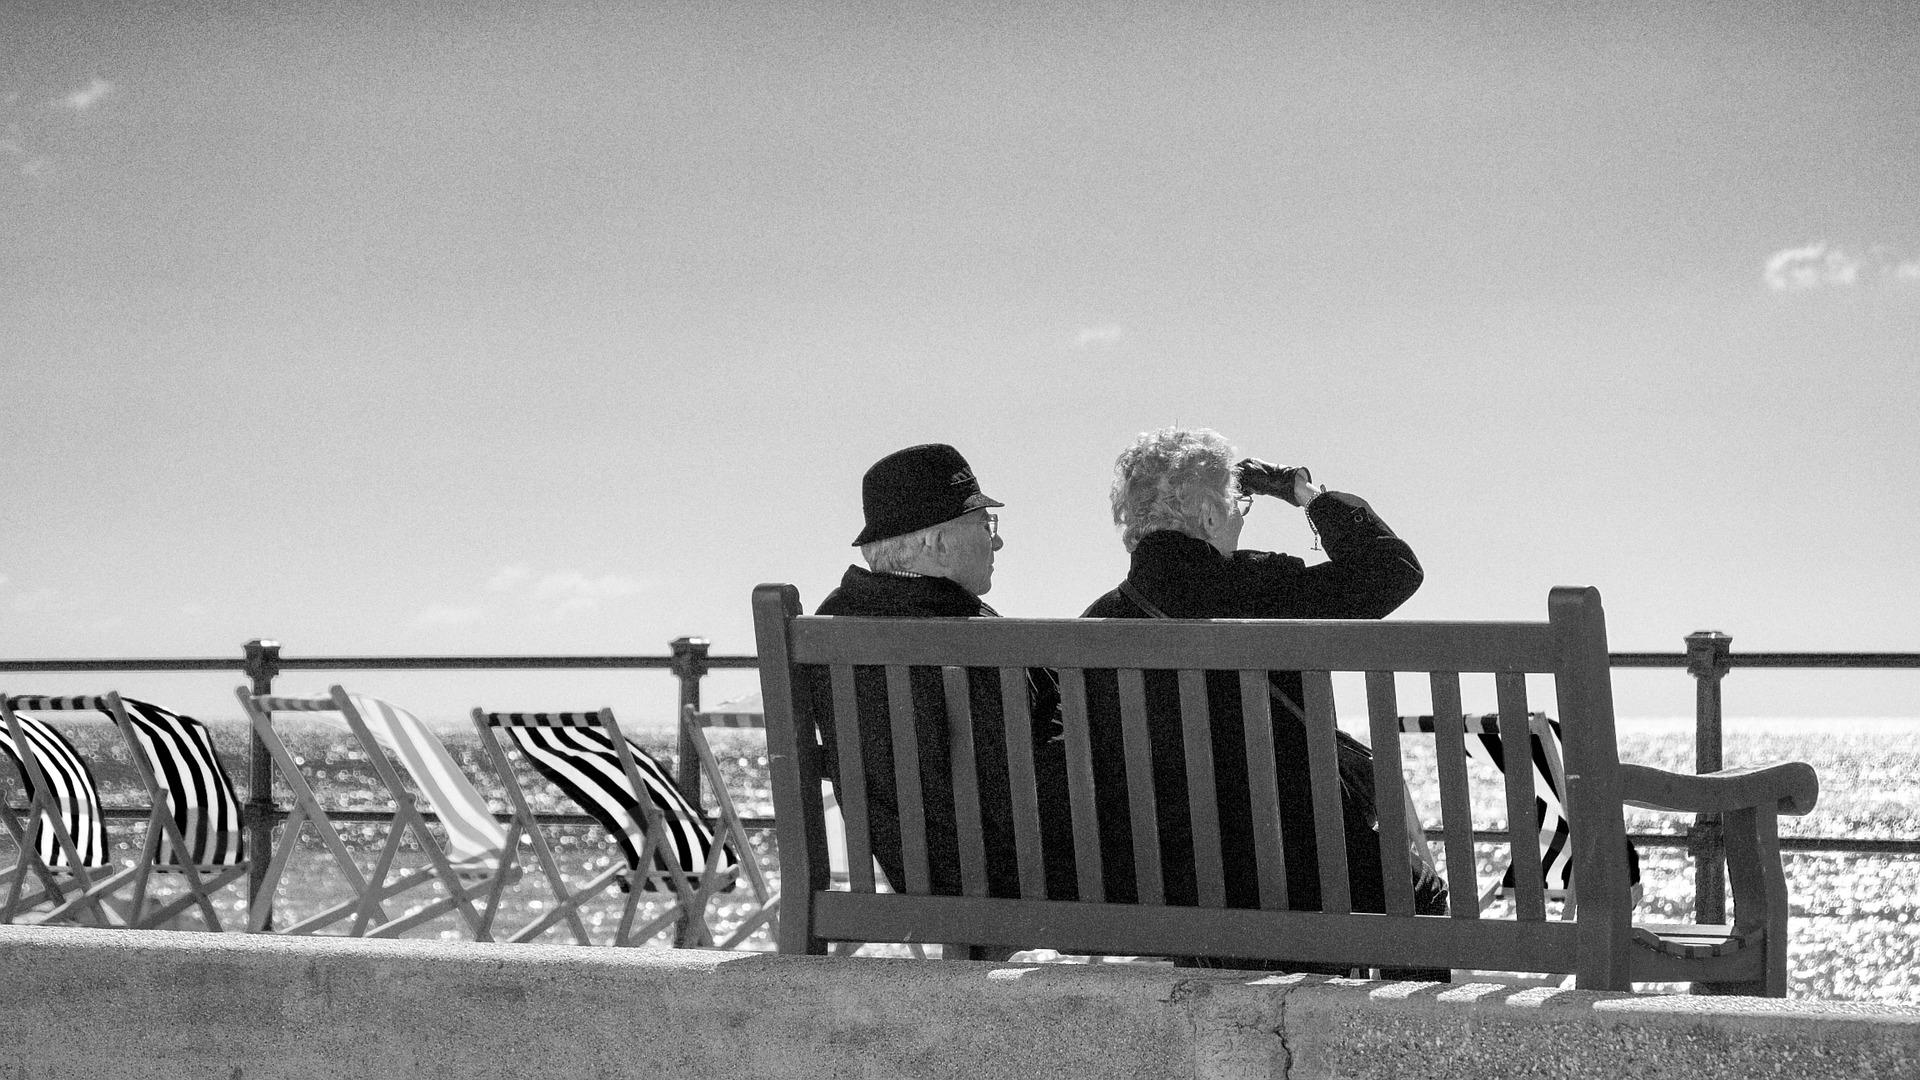 Senior Coast Beach View Bench Sea Couple People